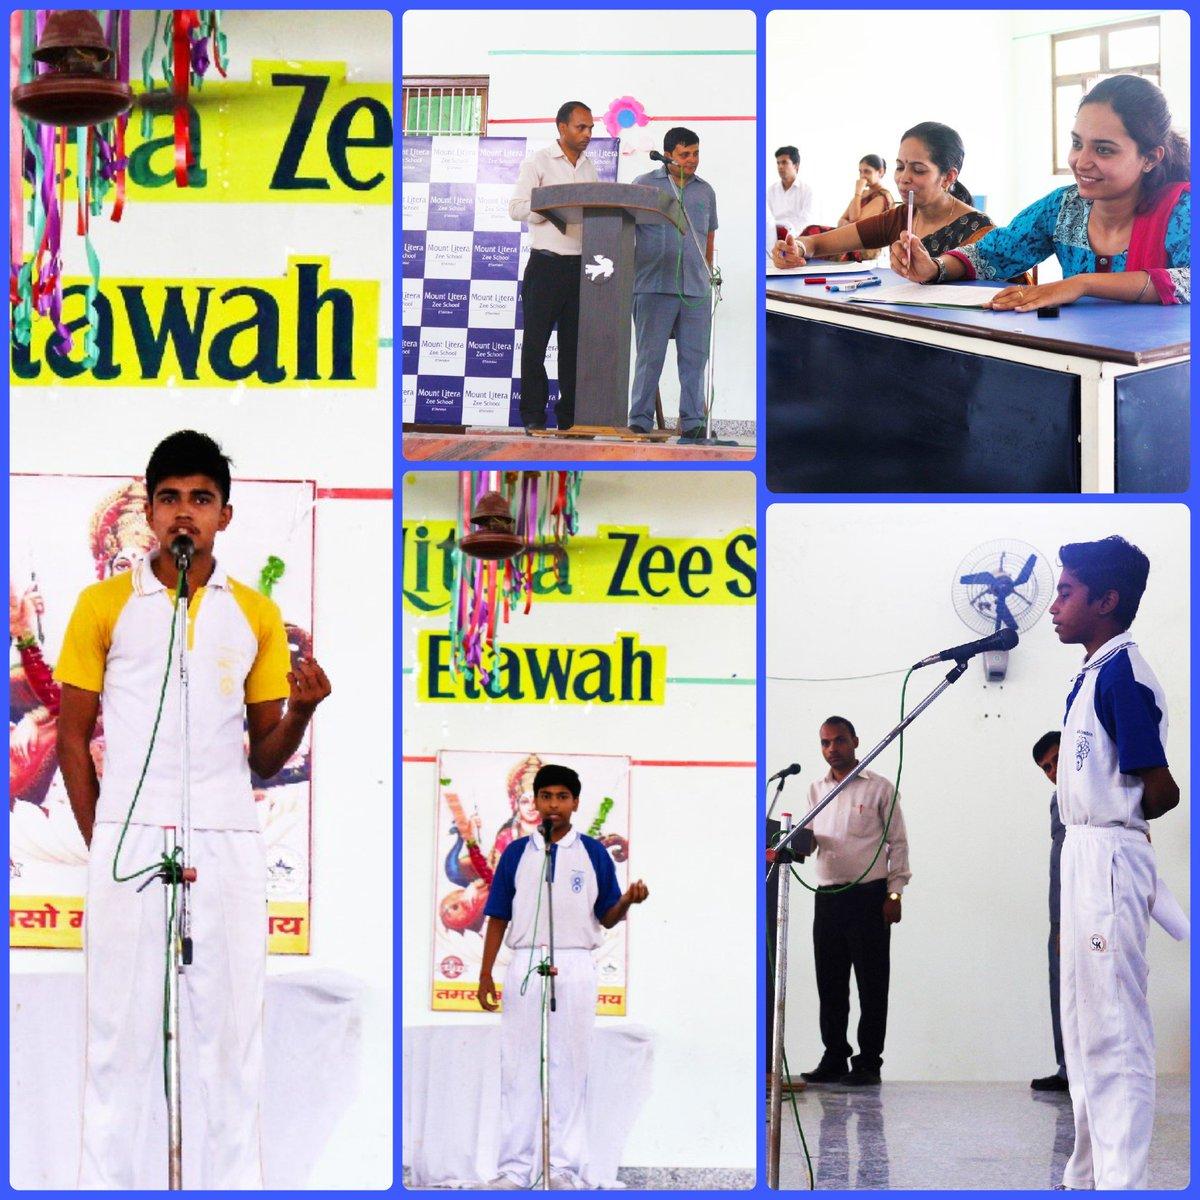 Zee School Etawah On Twitter Etawahs Mount Literans Performed In